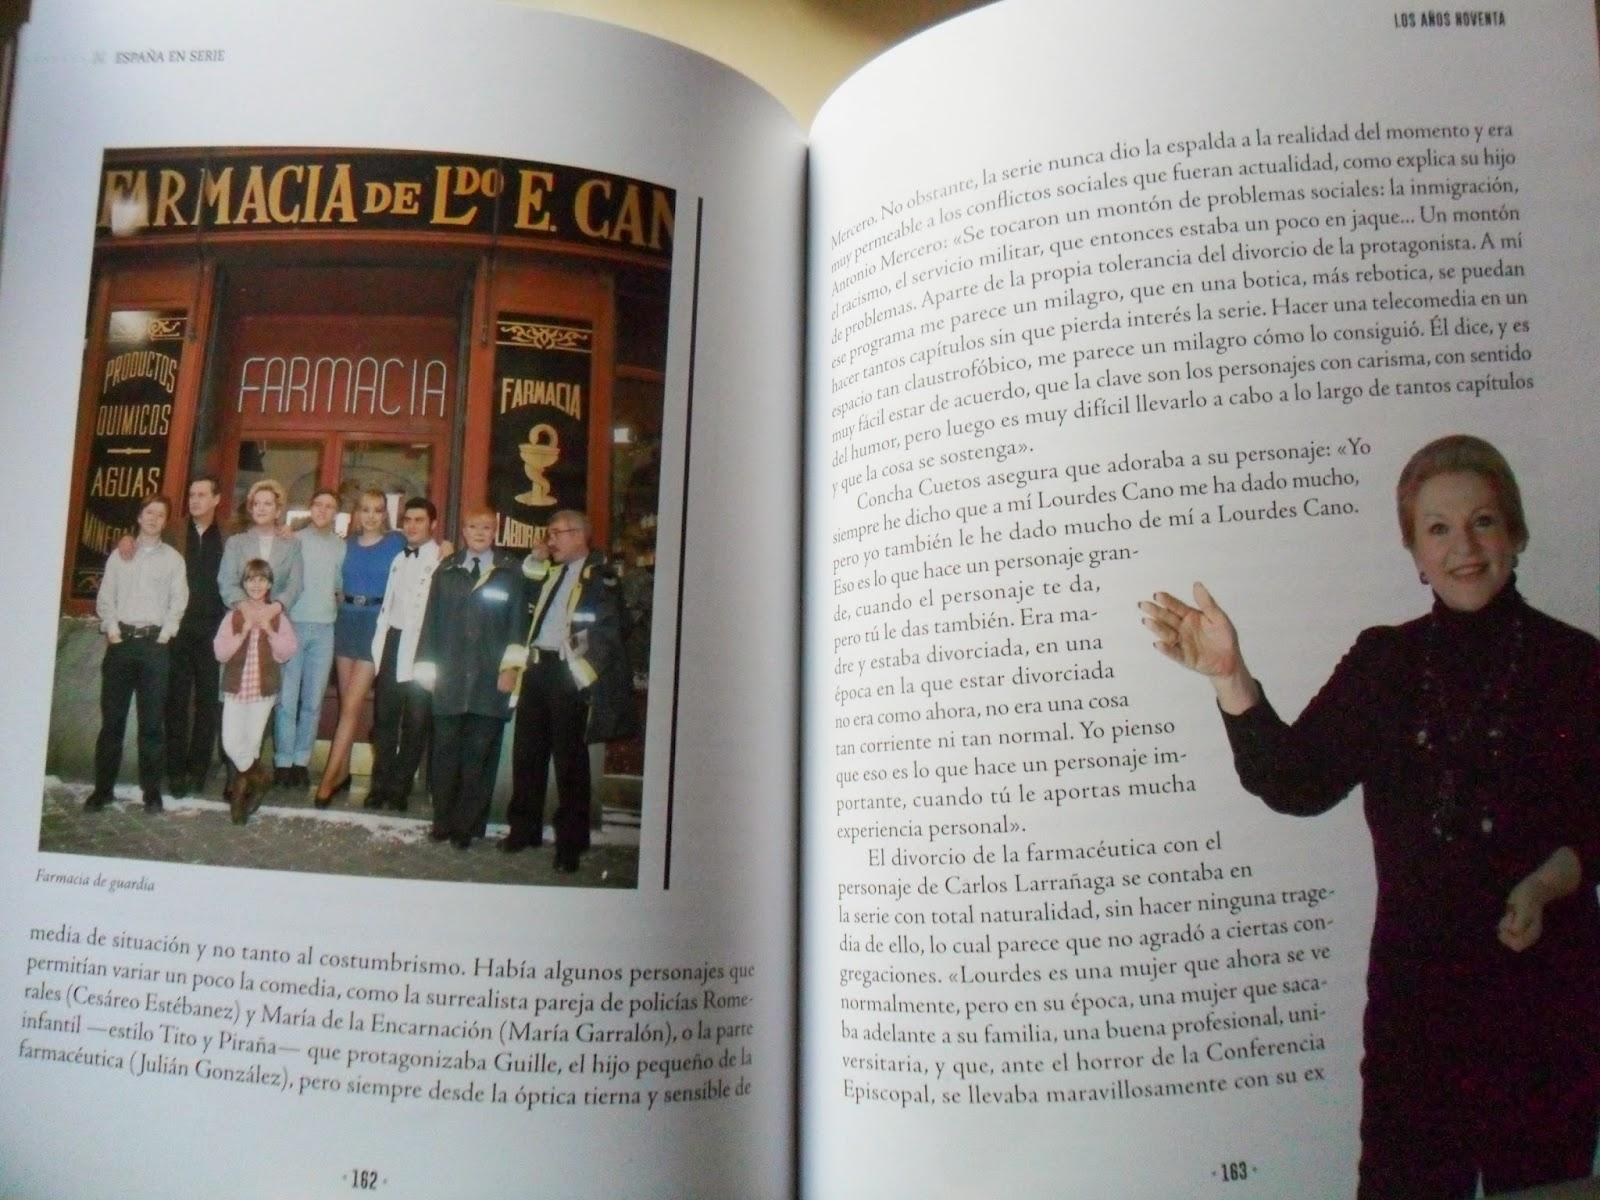 La serie de Antena 3 Farmacia de guardia, en España en serie